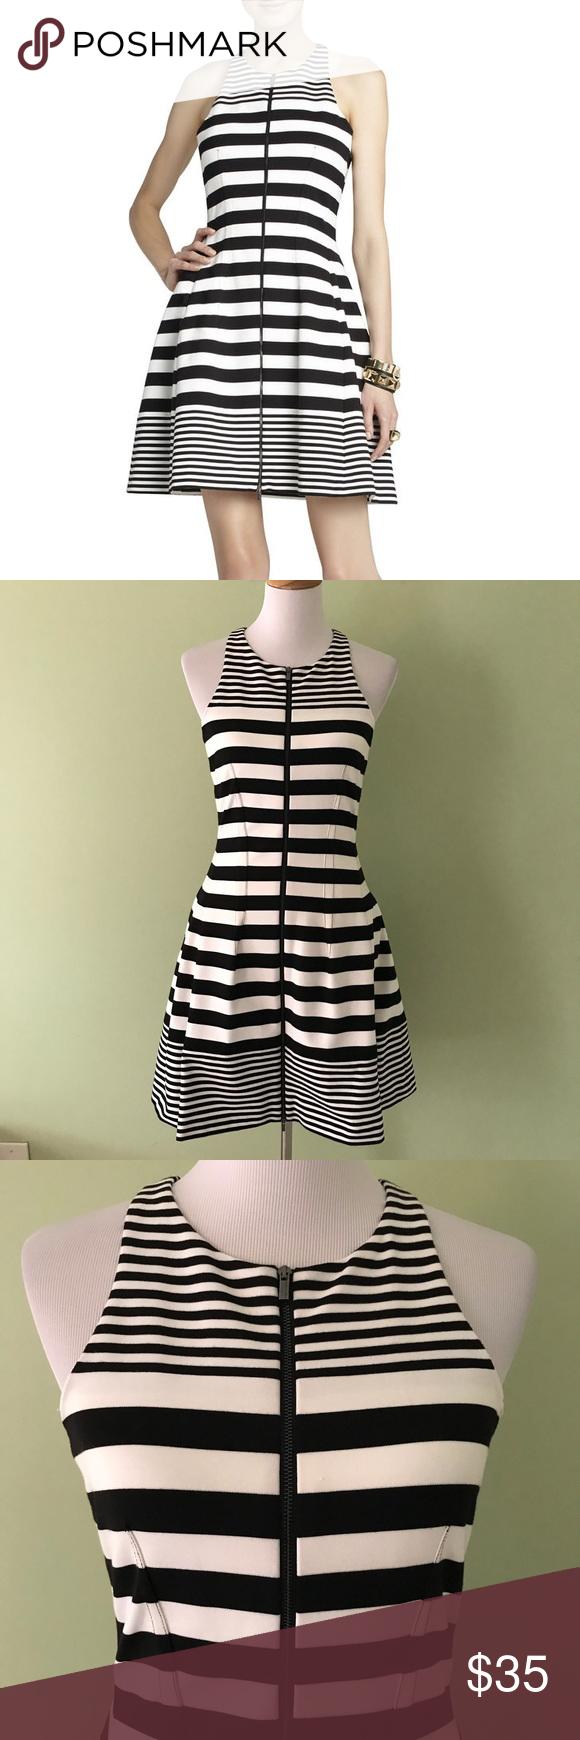 Bcbgmaxazria Black White Guilianna Tulip Dress Bcbg Maxazria Guilianna Tulip Dress Black White Striped Full Front Zip Tulip Dress Dresses Clothes Design [ 1740 x 580 Pixel ]